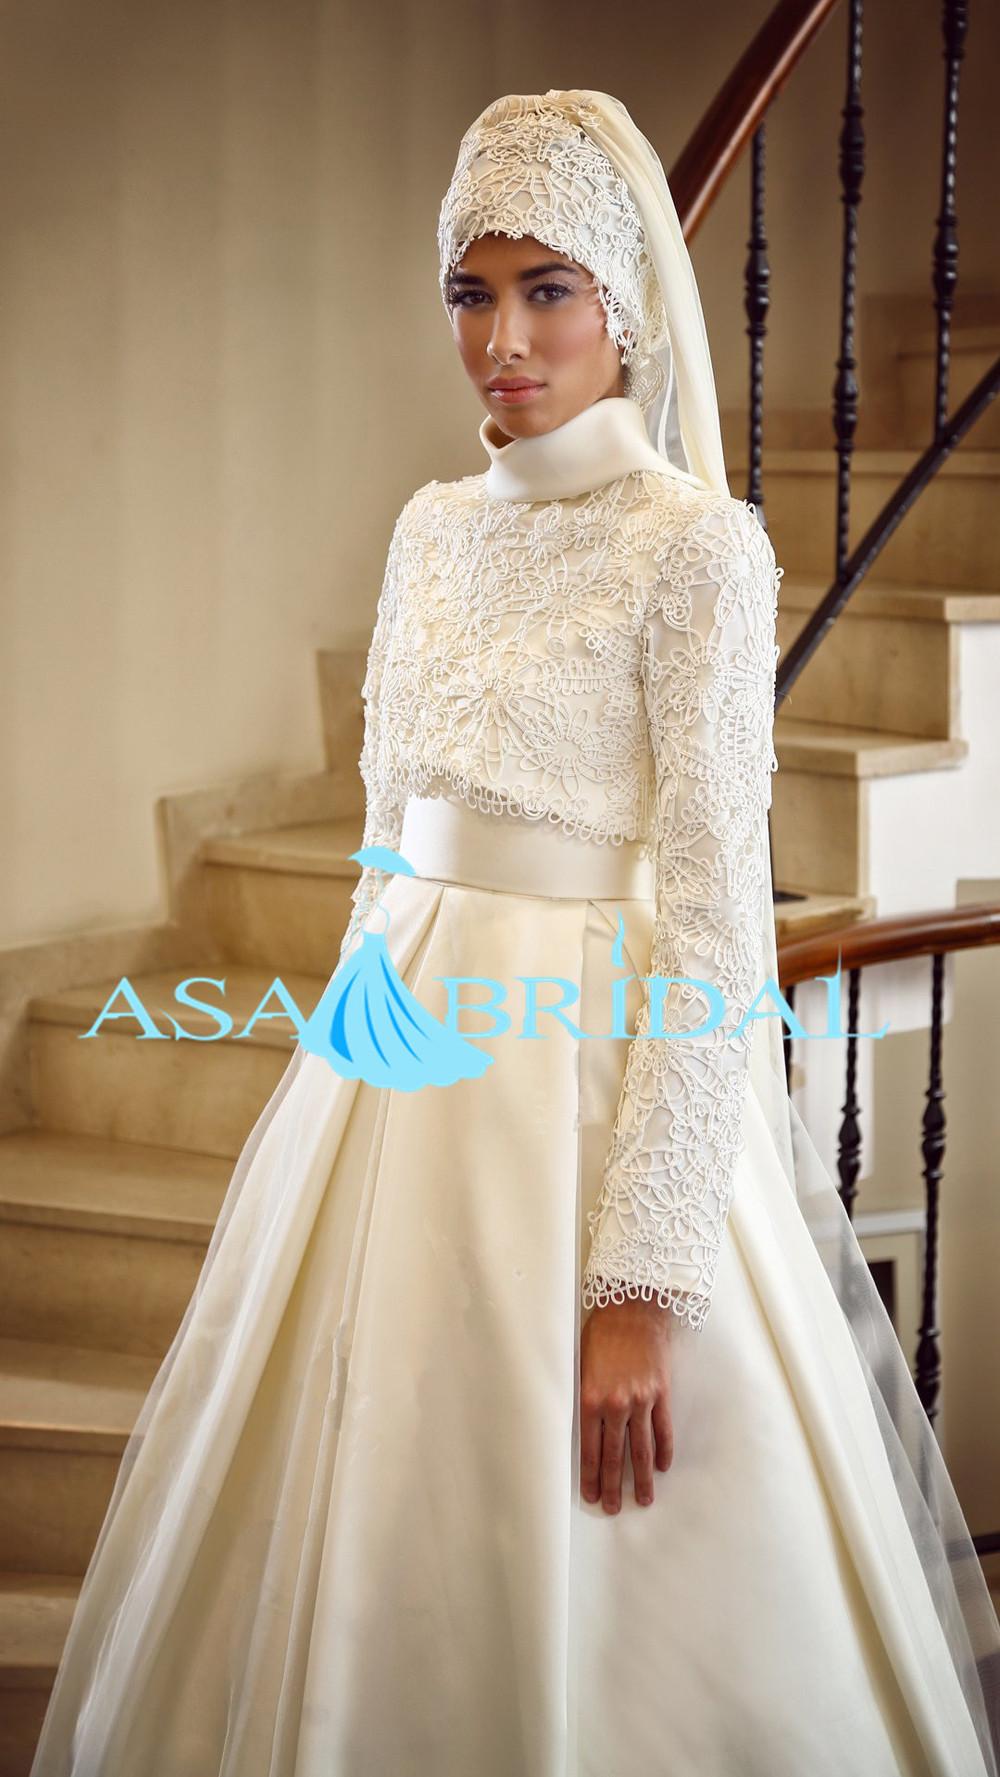 2015 Nouvelle Arabe Blanc Manches Longues Gelinlik Perles Turc Hijab Musulman Robe De Mariée Musl 1891 Buy Robe De Mariée Musulmane Hijabrobe De